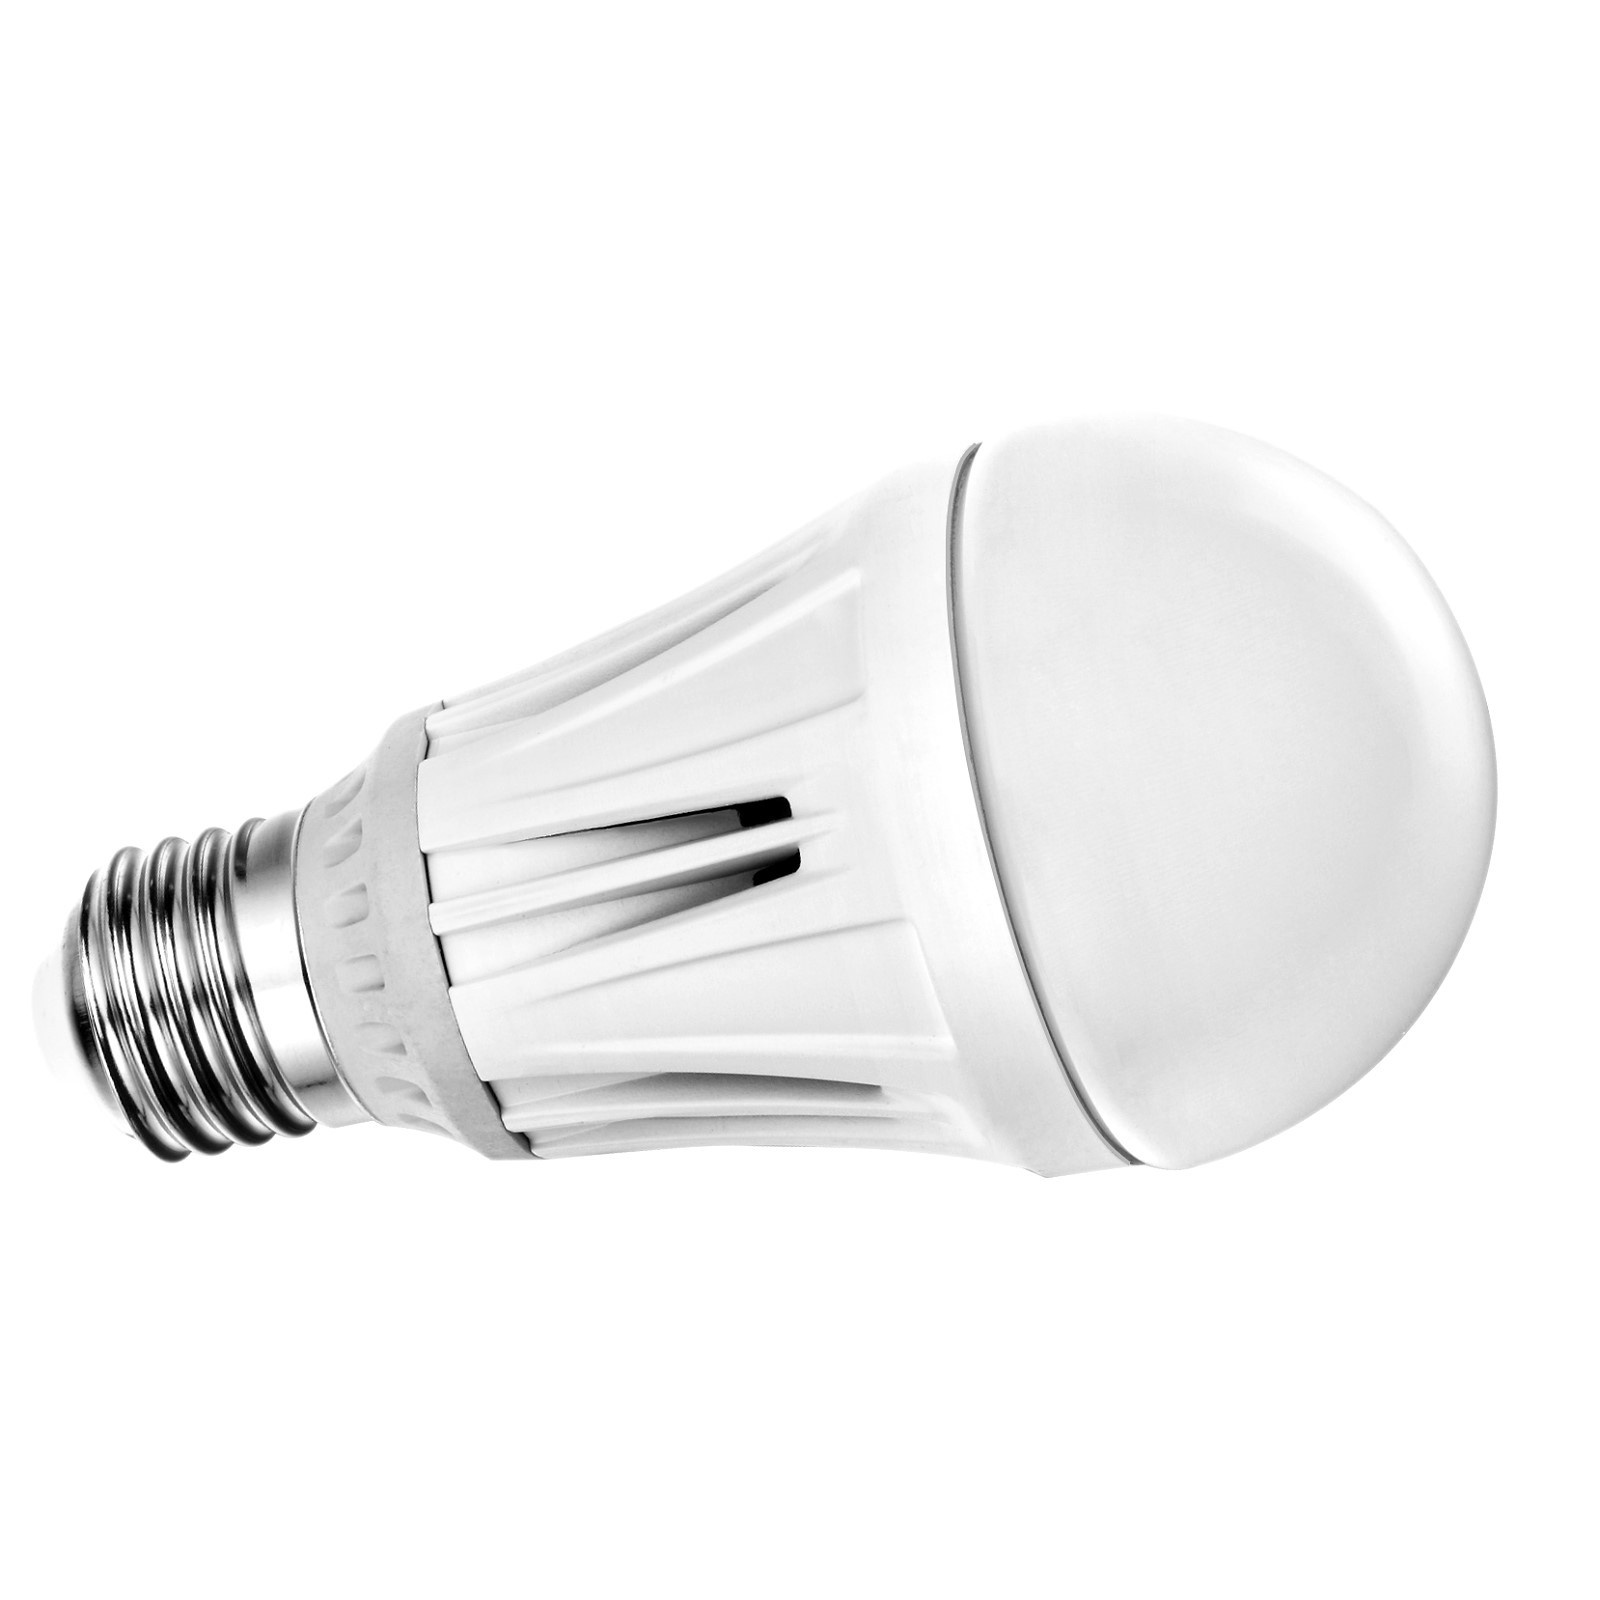 769-E27-A60-1600x1600 Wunderbar Lampe Mit E27 Fassung Dekorationen